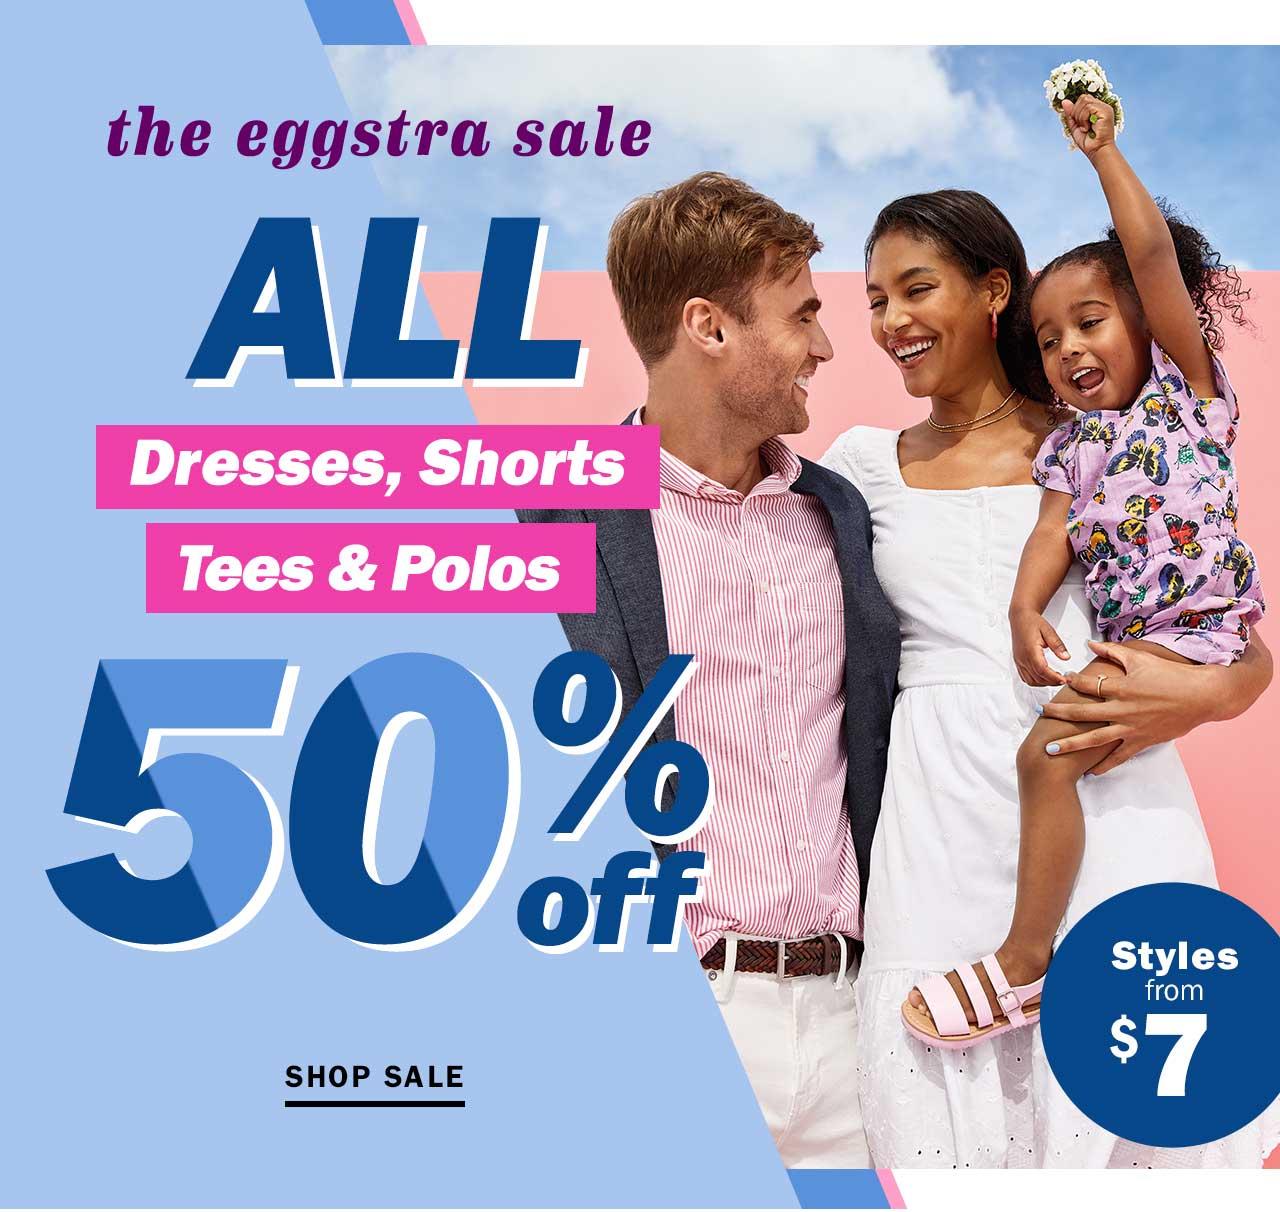 The eggstra sale